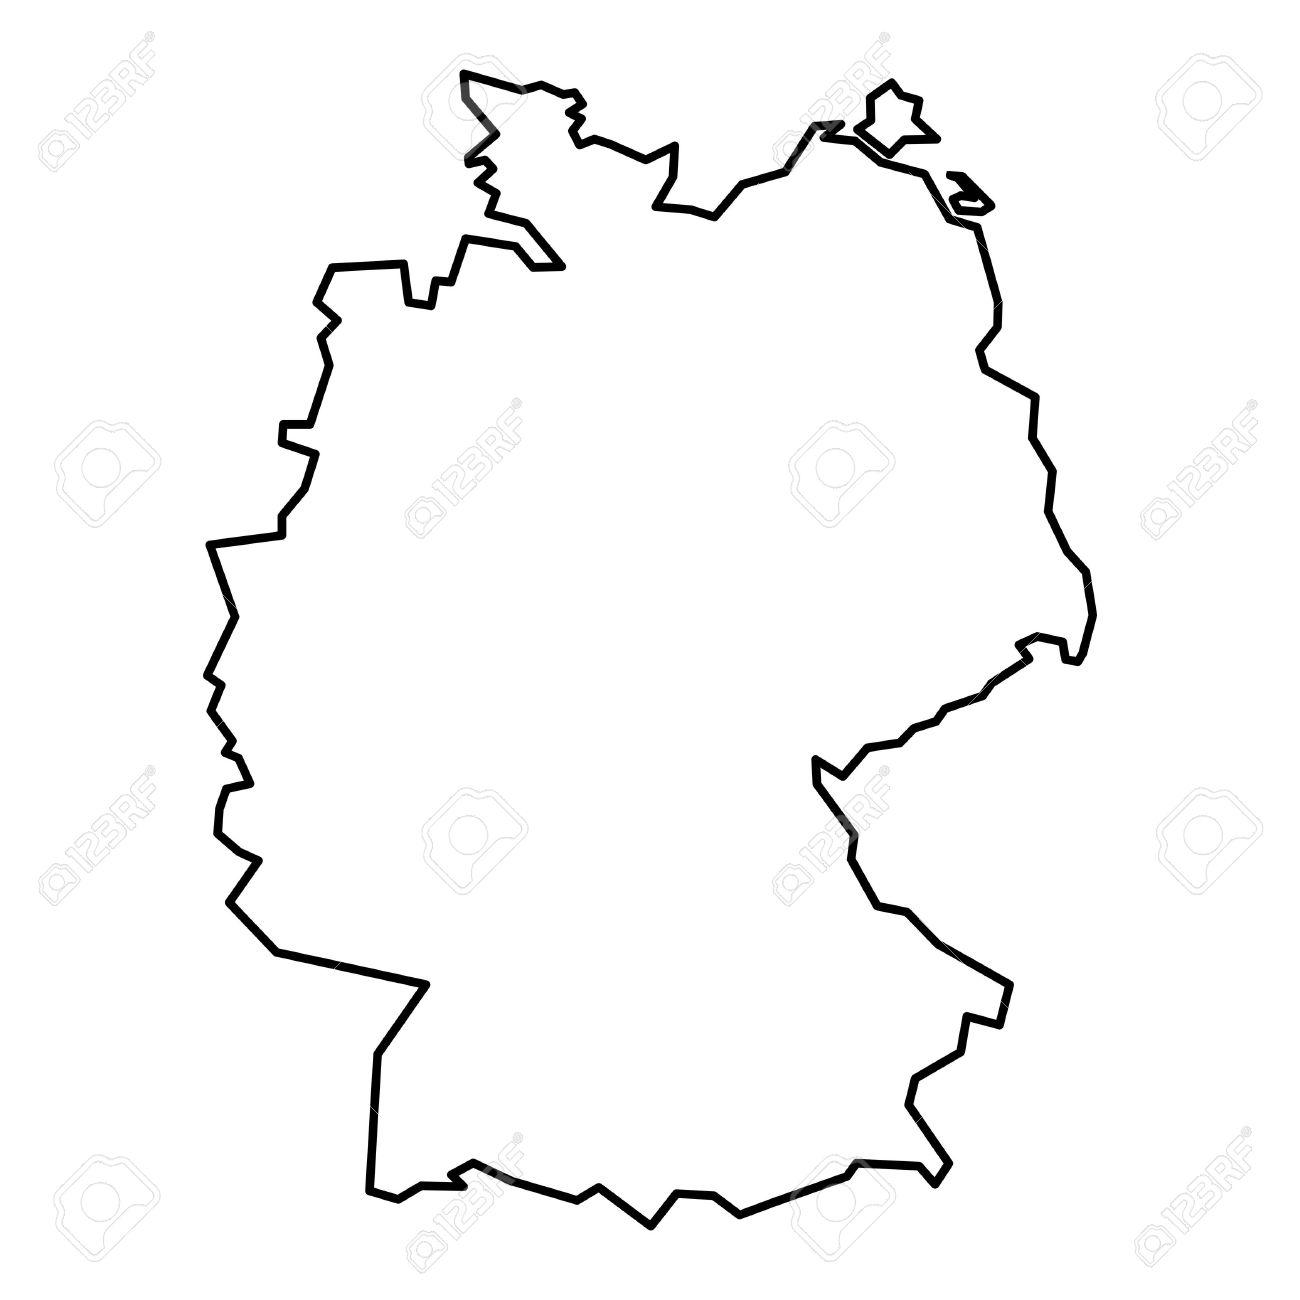 Germany Map Drawing At Getdrawings